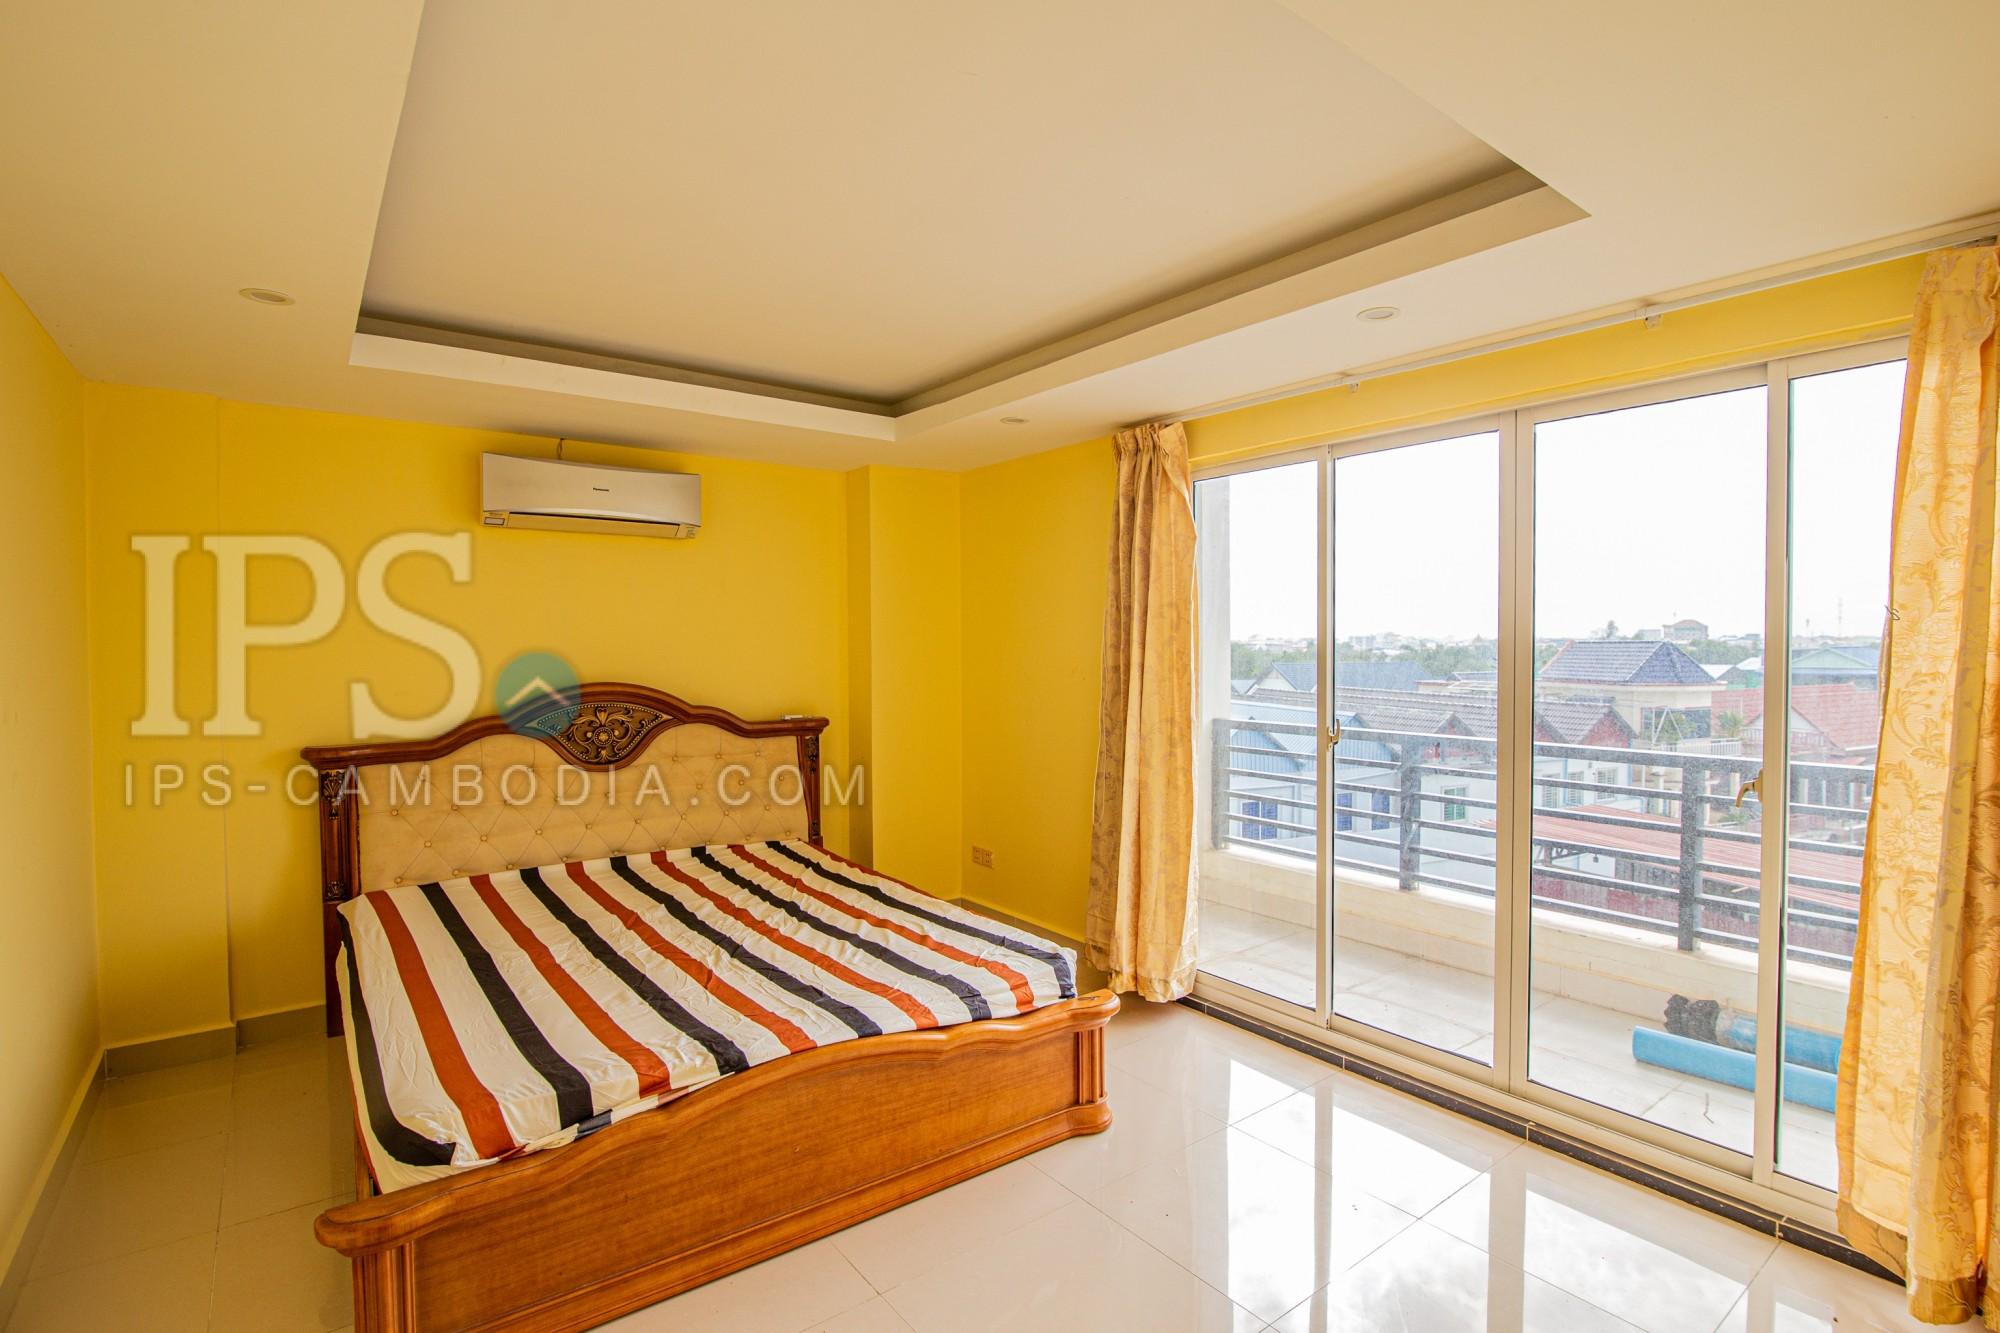 3 Bedroom Condo For Sale - Boeung Tumpun, Khan Meanchey, Phnom Penh